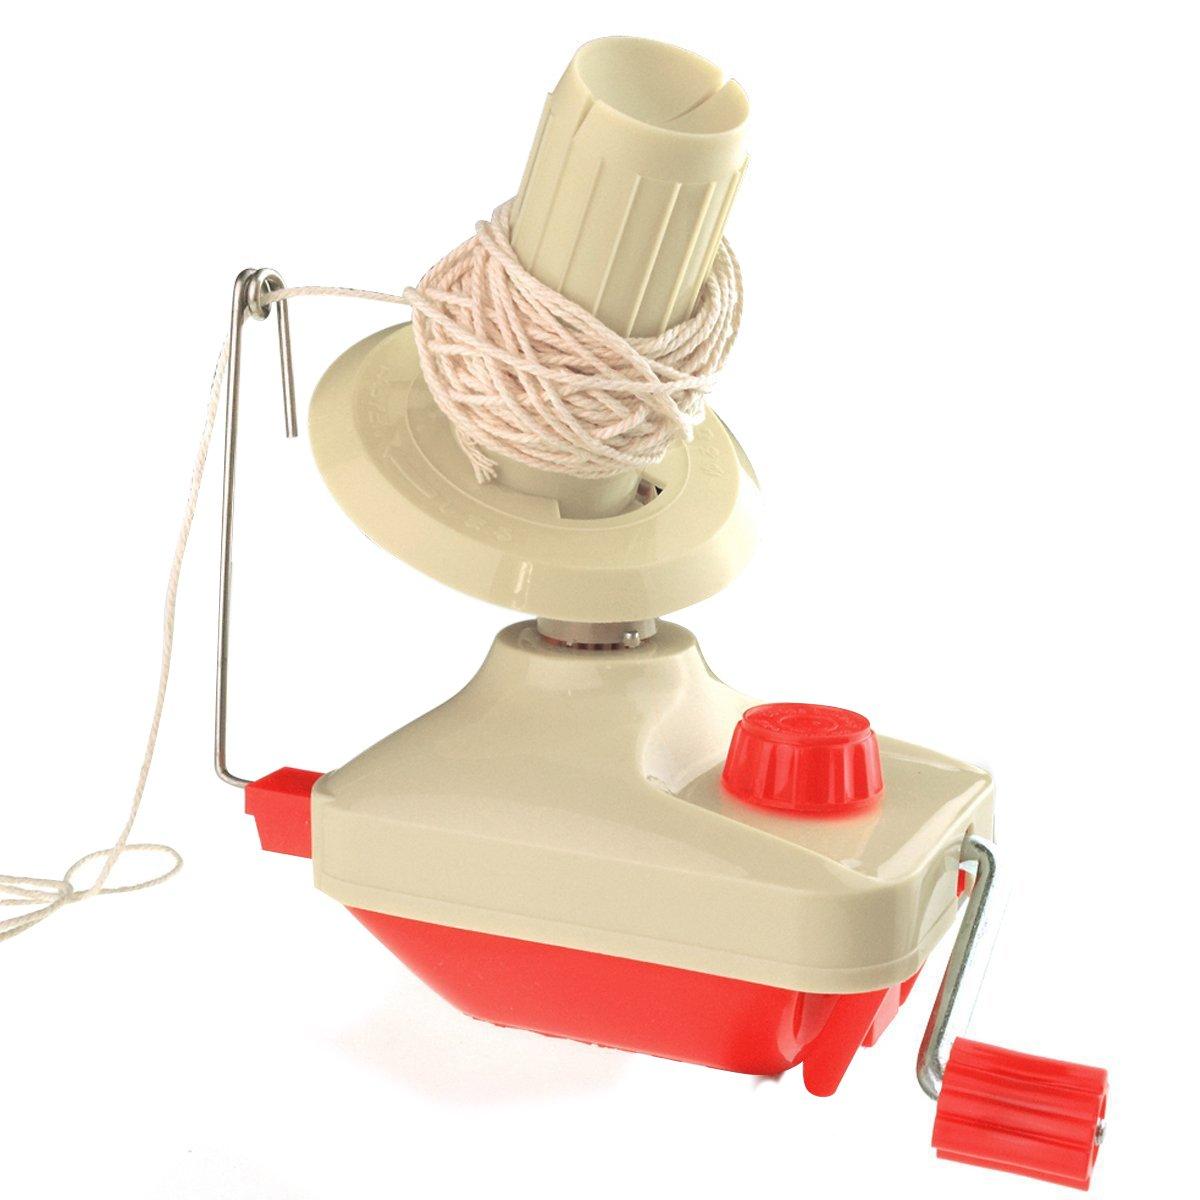 Marrywindix Bobbin Winder Yarn Winder Table Clasp, Hand Operated Manual Wool Winder Holder for Swift Yarn Fiber String Ball